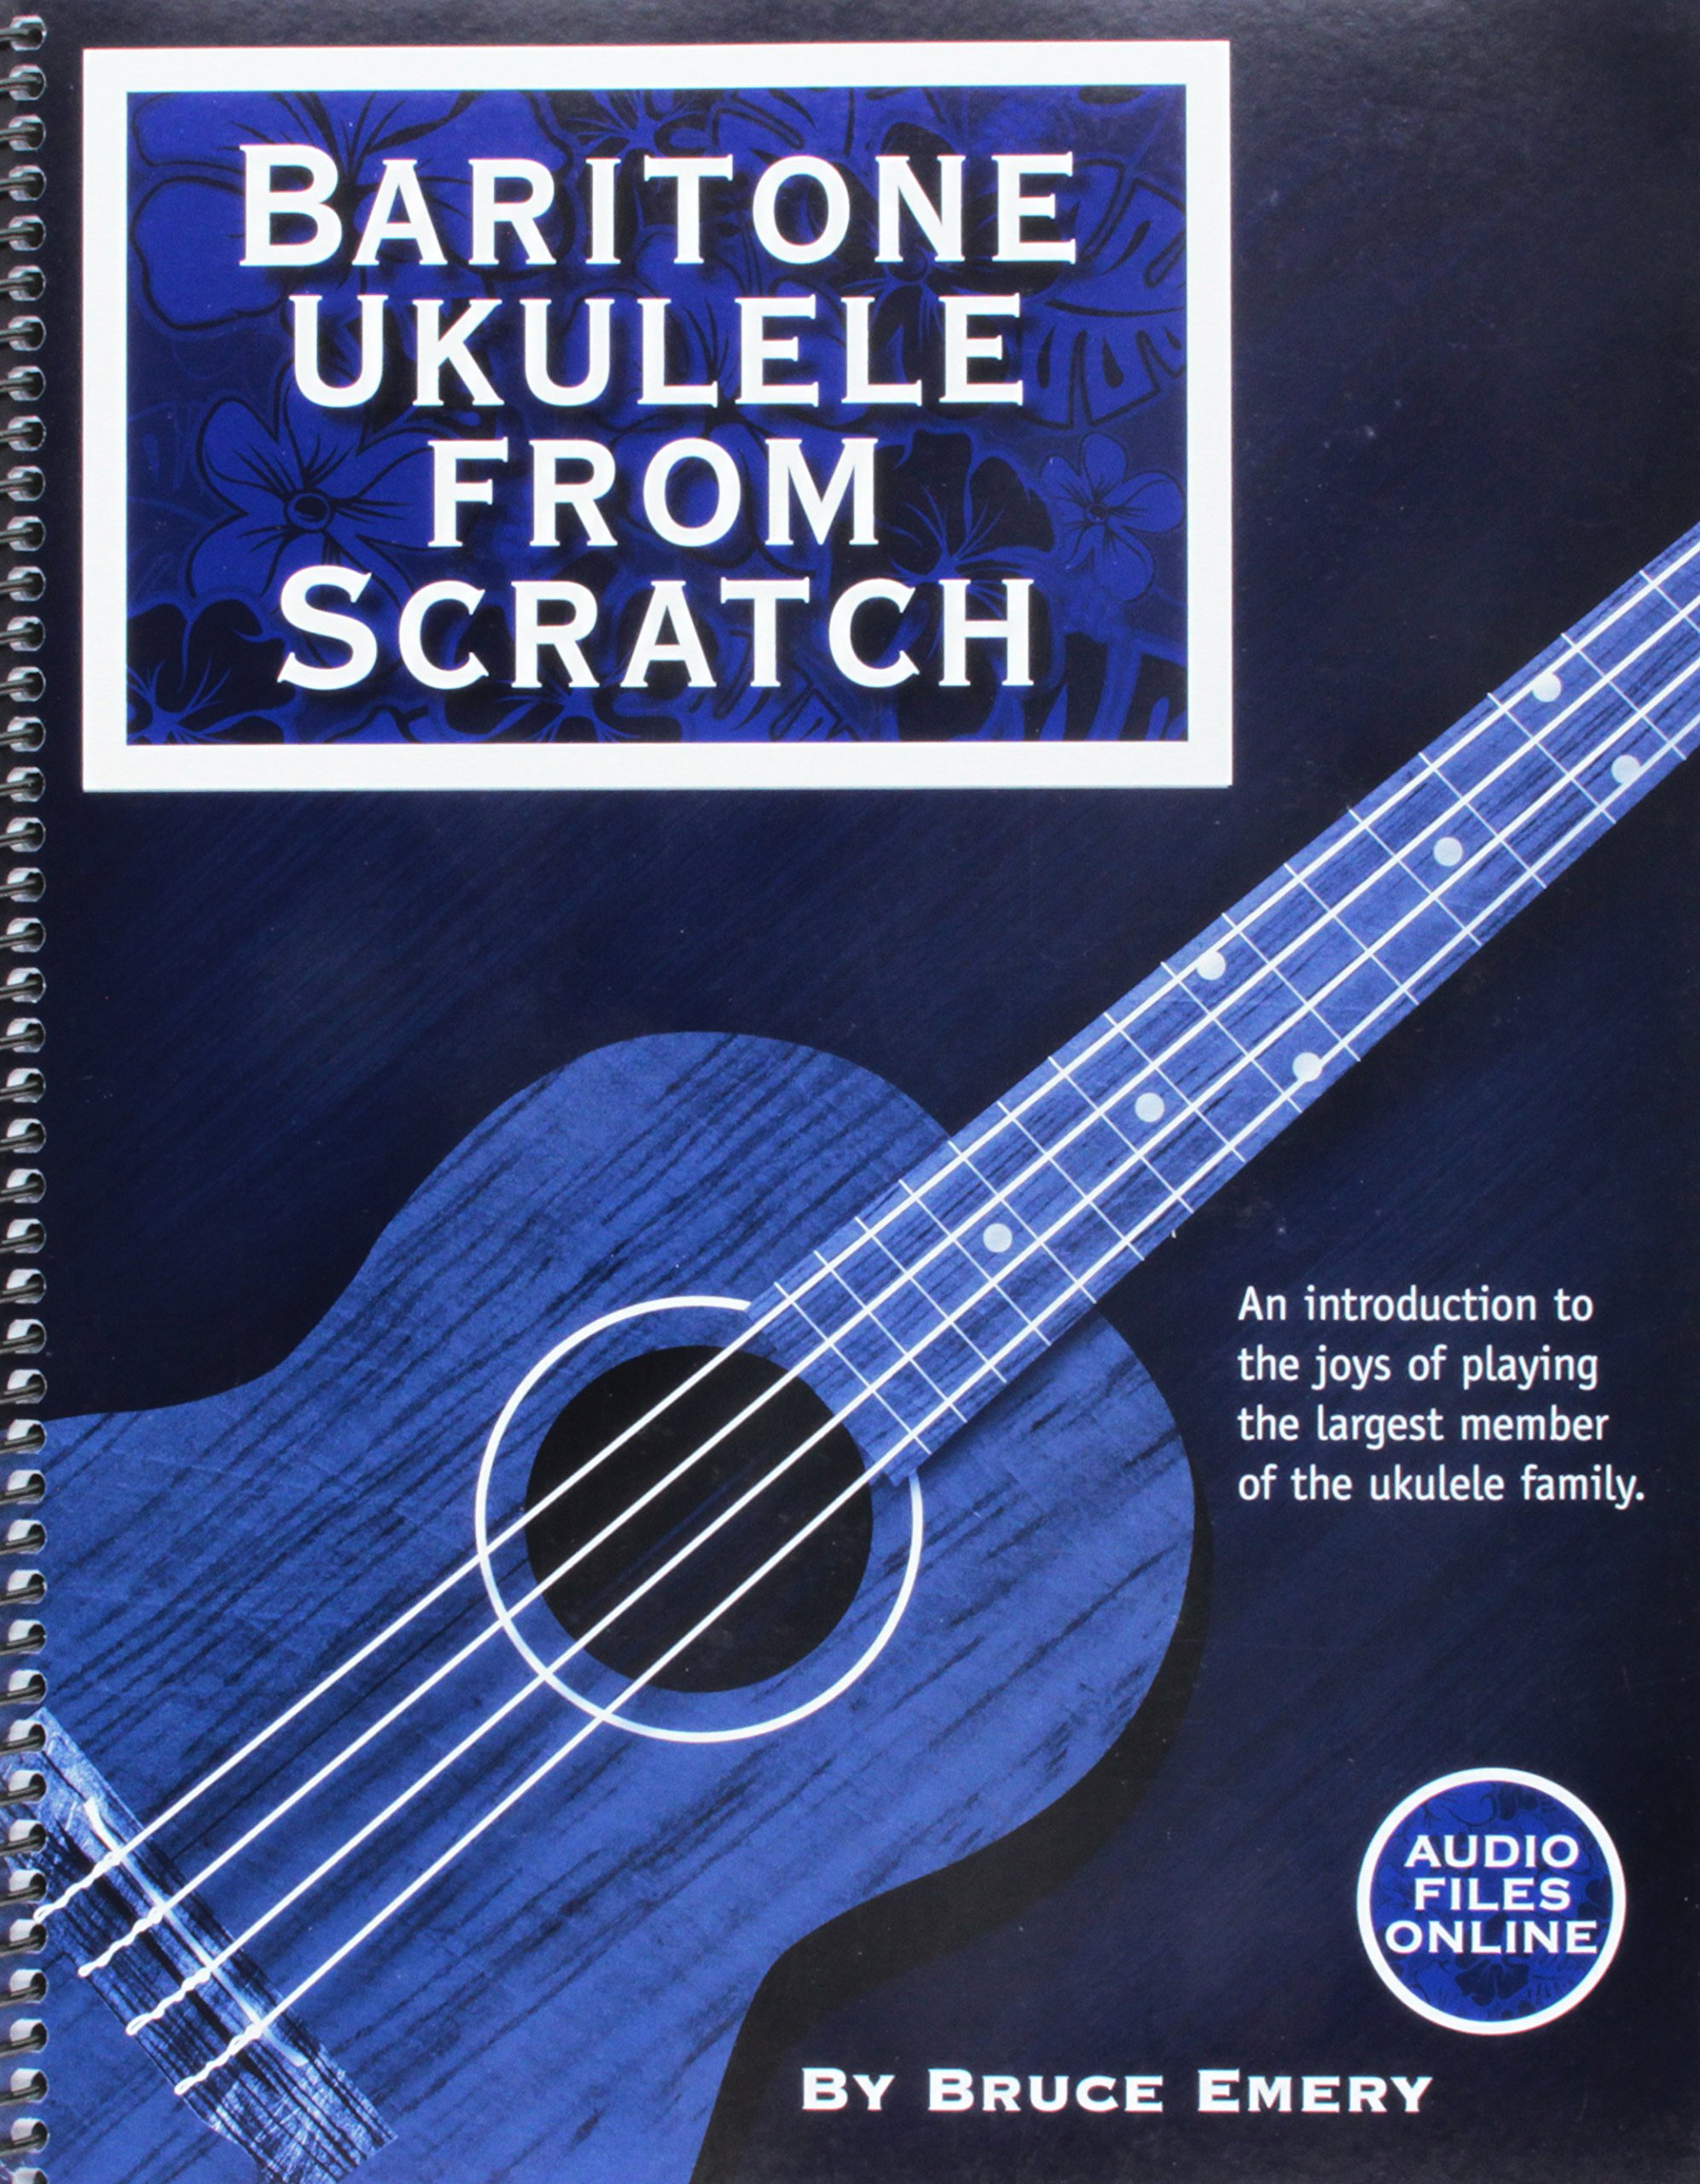 Download Baritone Ukulele from Scratch pdf